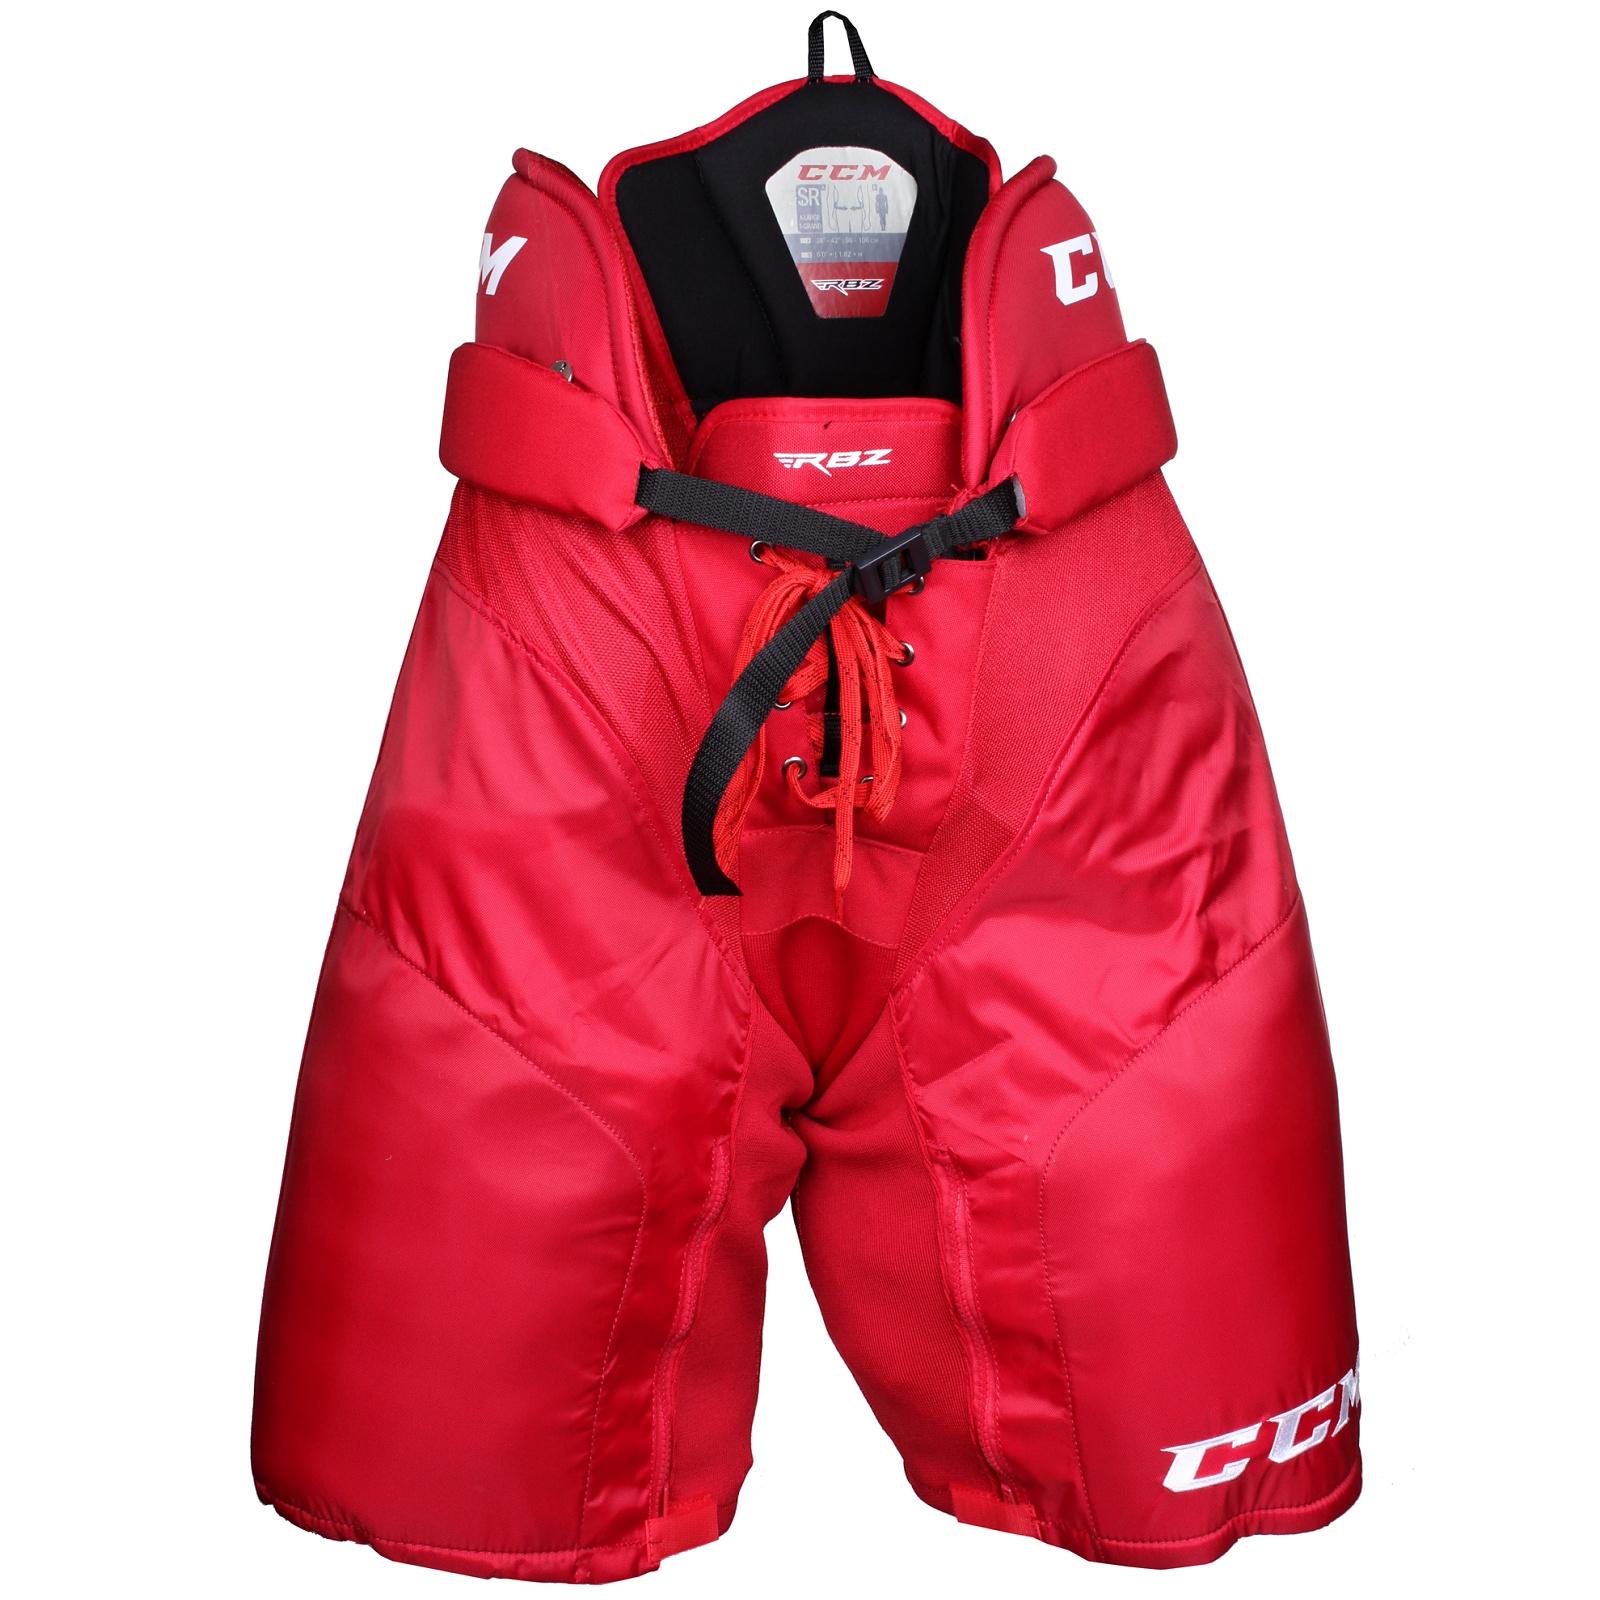 Kalhoty hráčské CCM RBZ 130 senior červené - vel. L